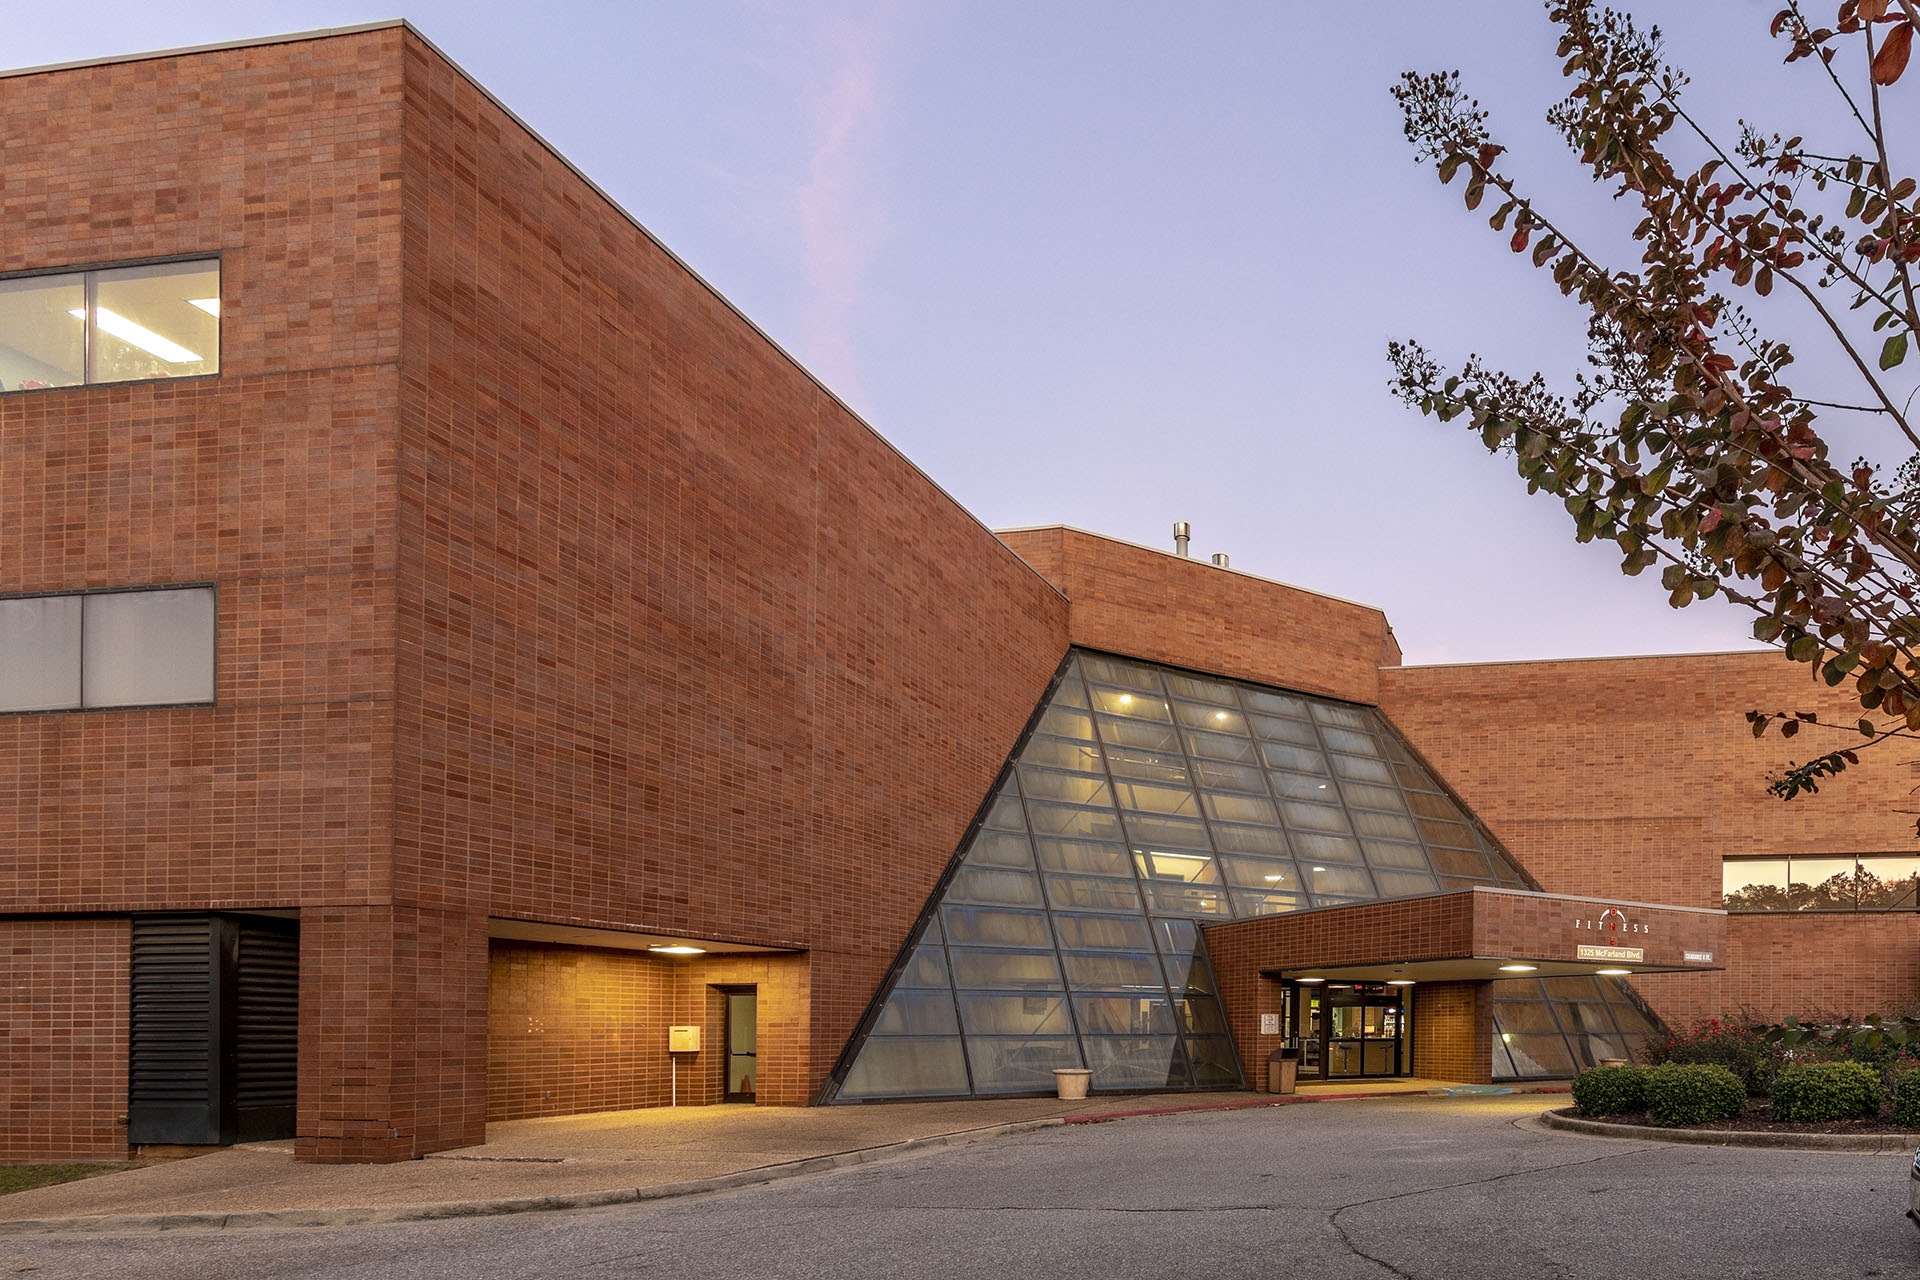 UMC Northport